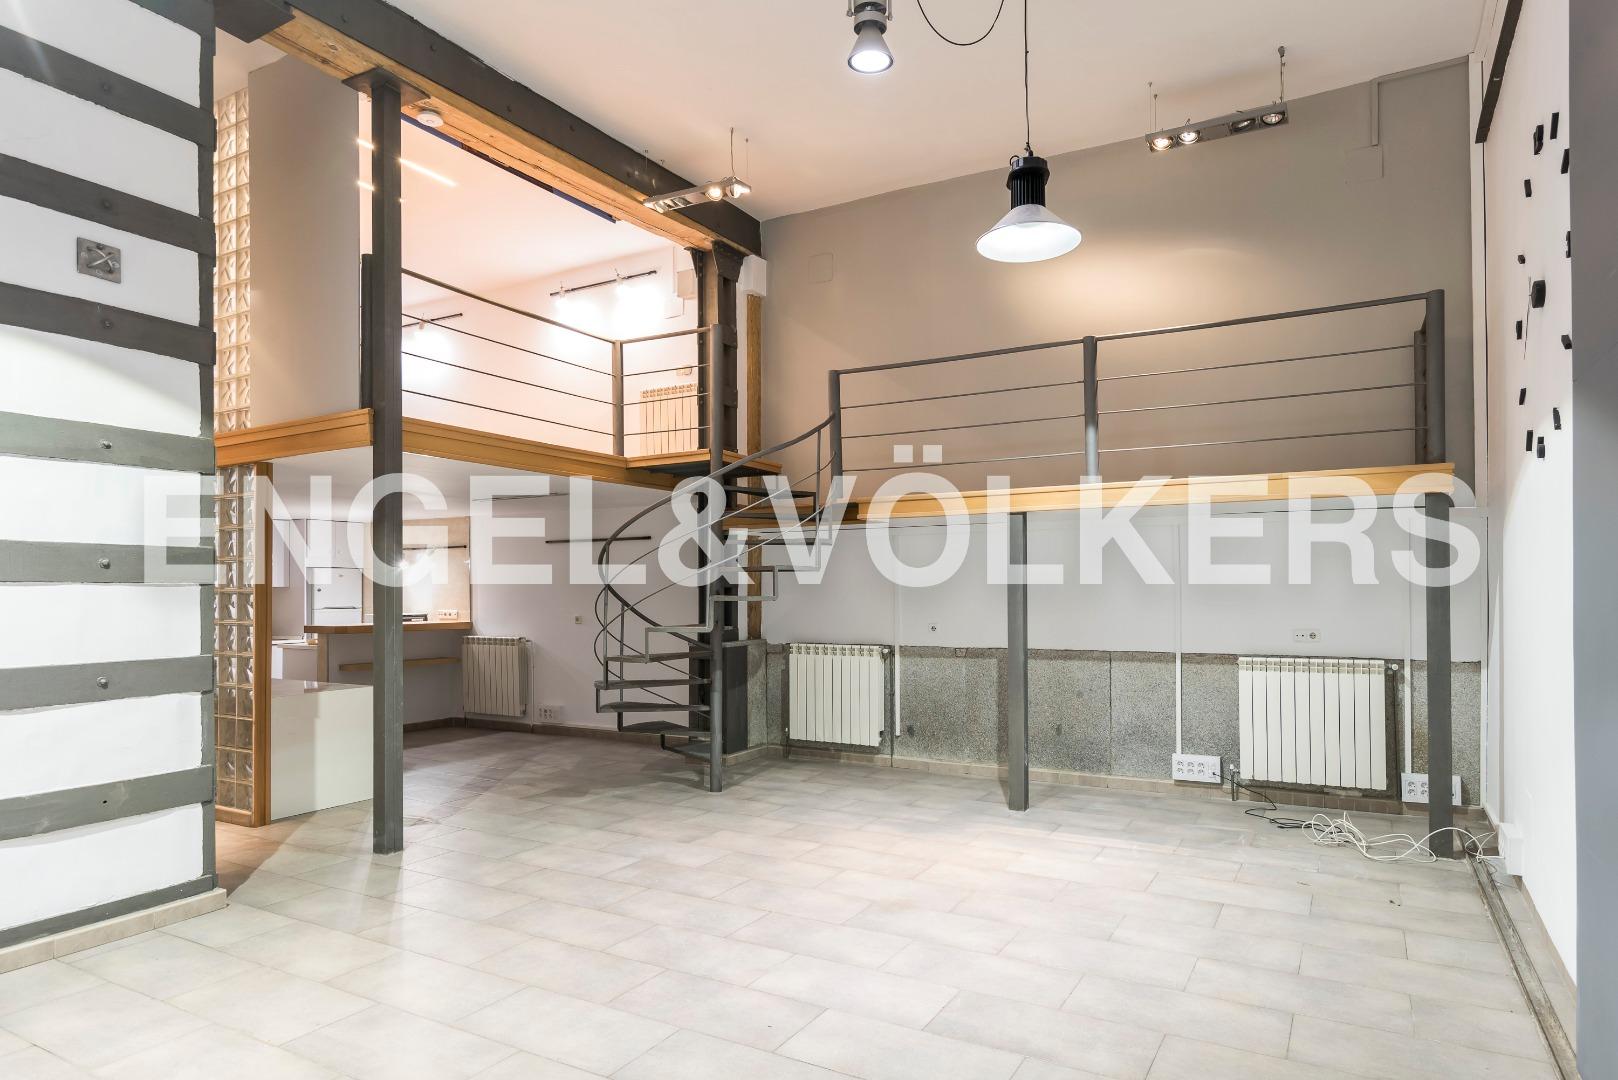 Alquiler Piso  Calle alfonso xii. Moderno loft en el retiro